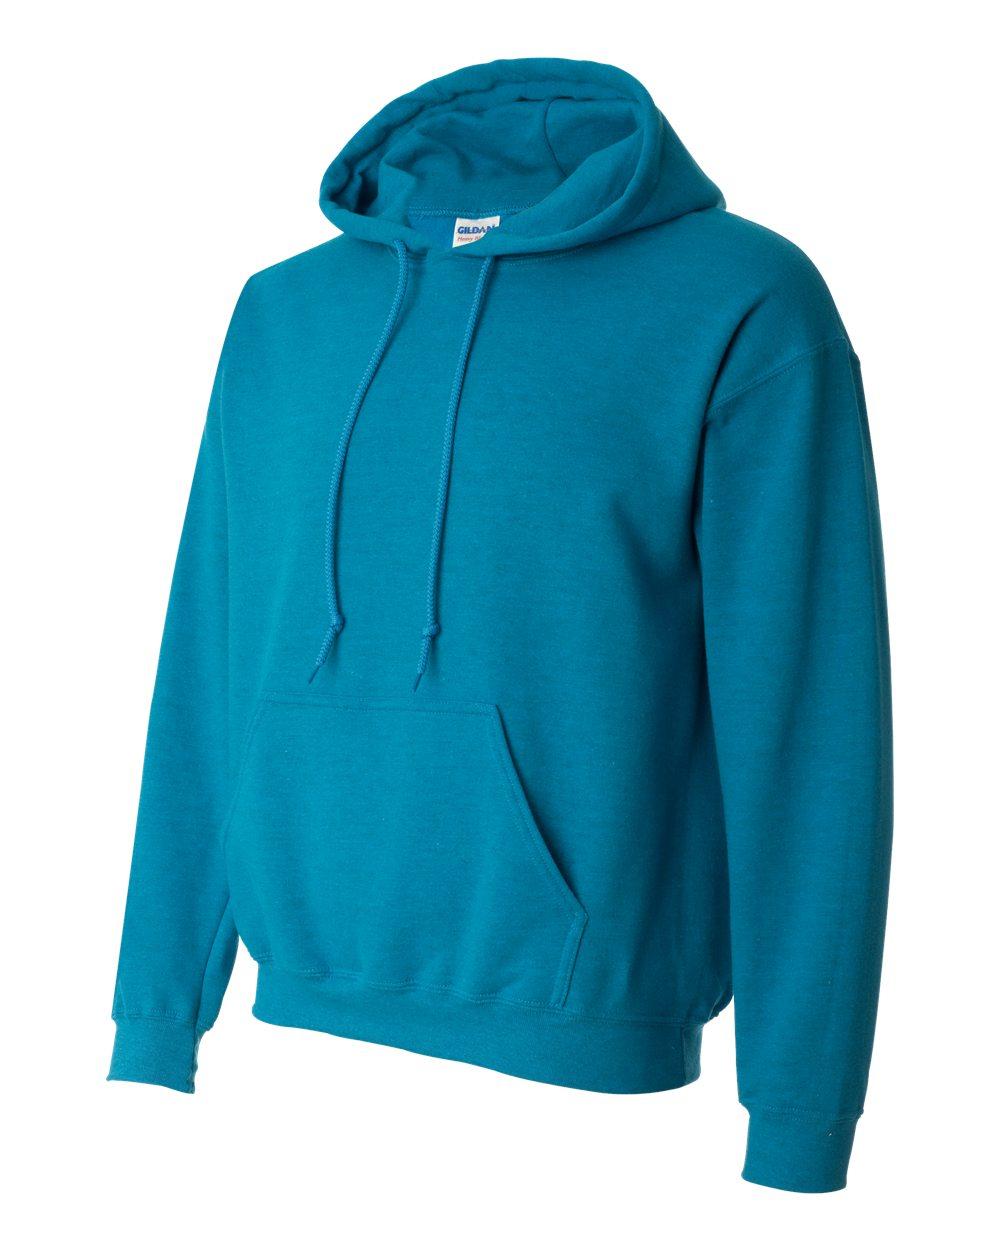 Gildan Heavy Blend Hooded Sweatshirt GI18500 Antique Sapphire Blue